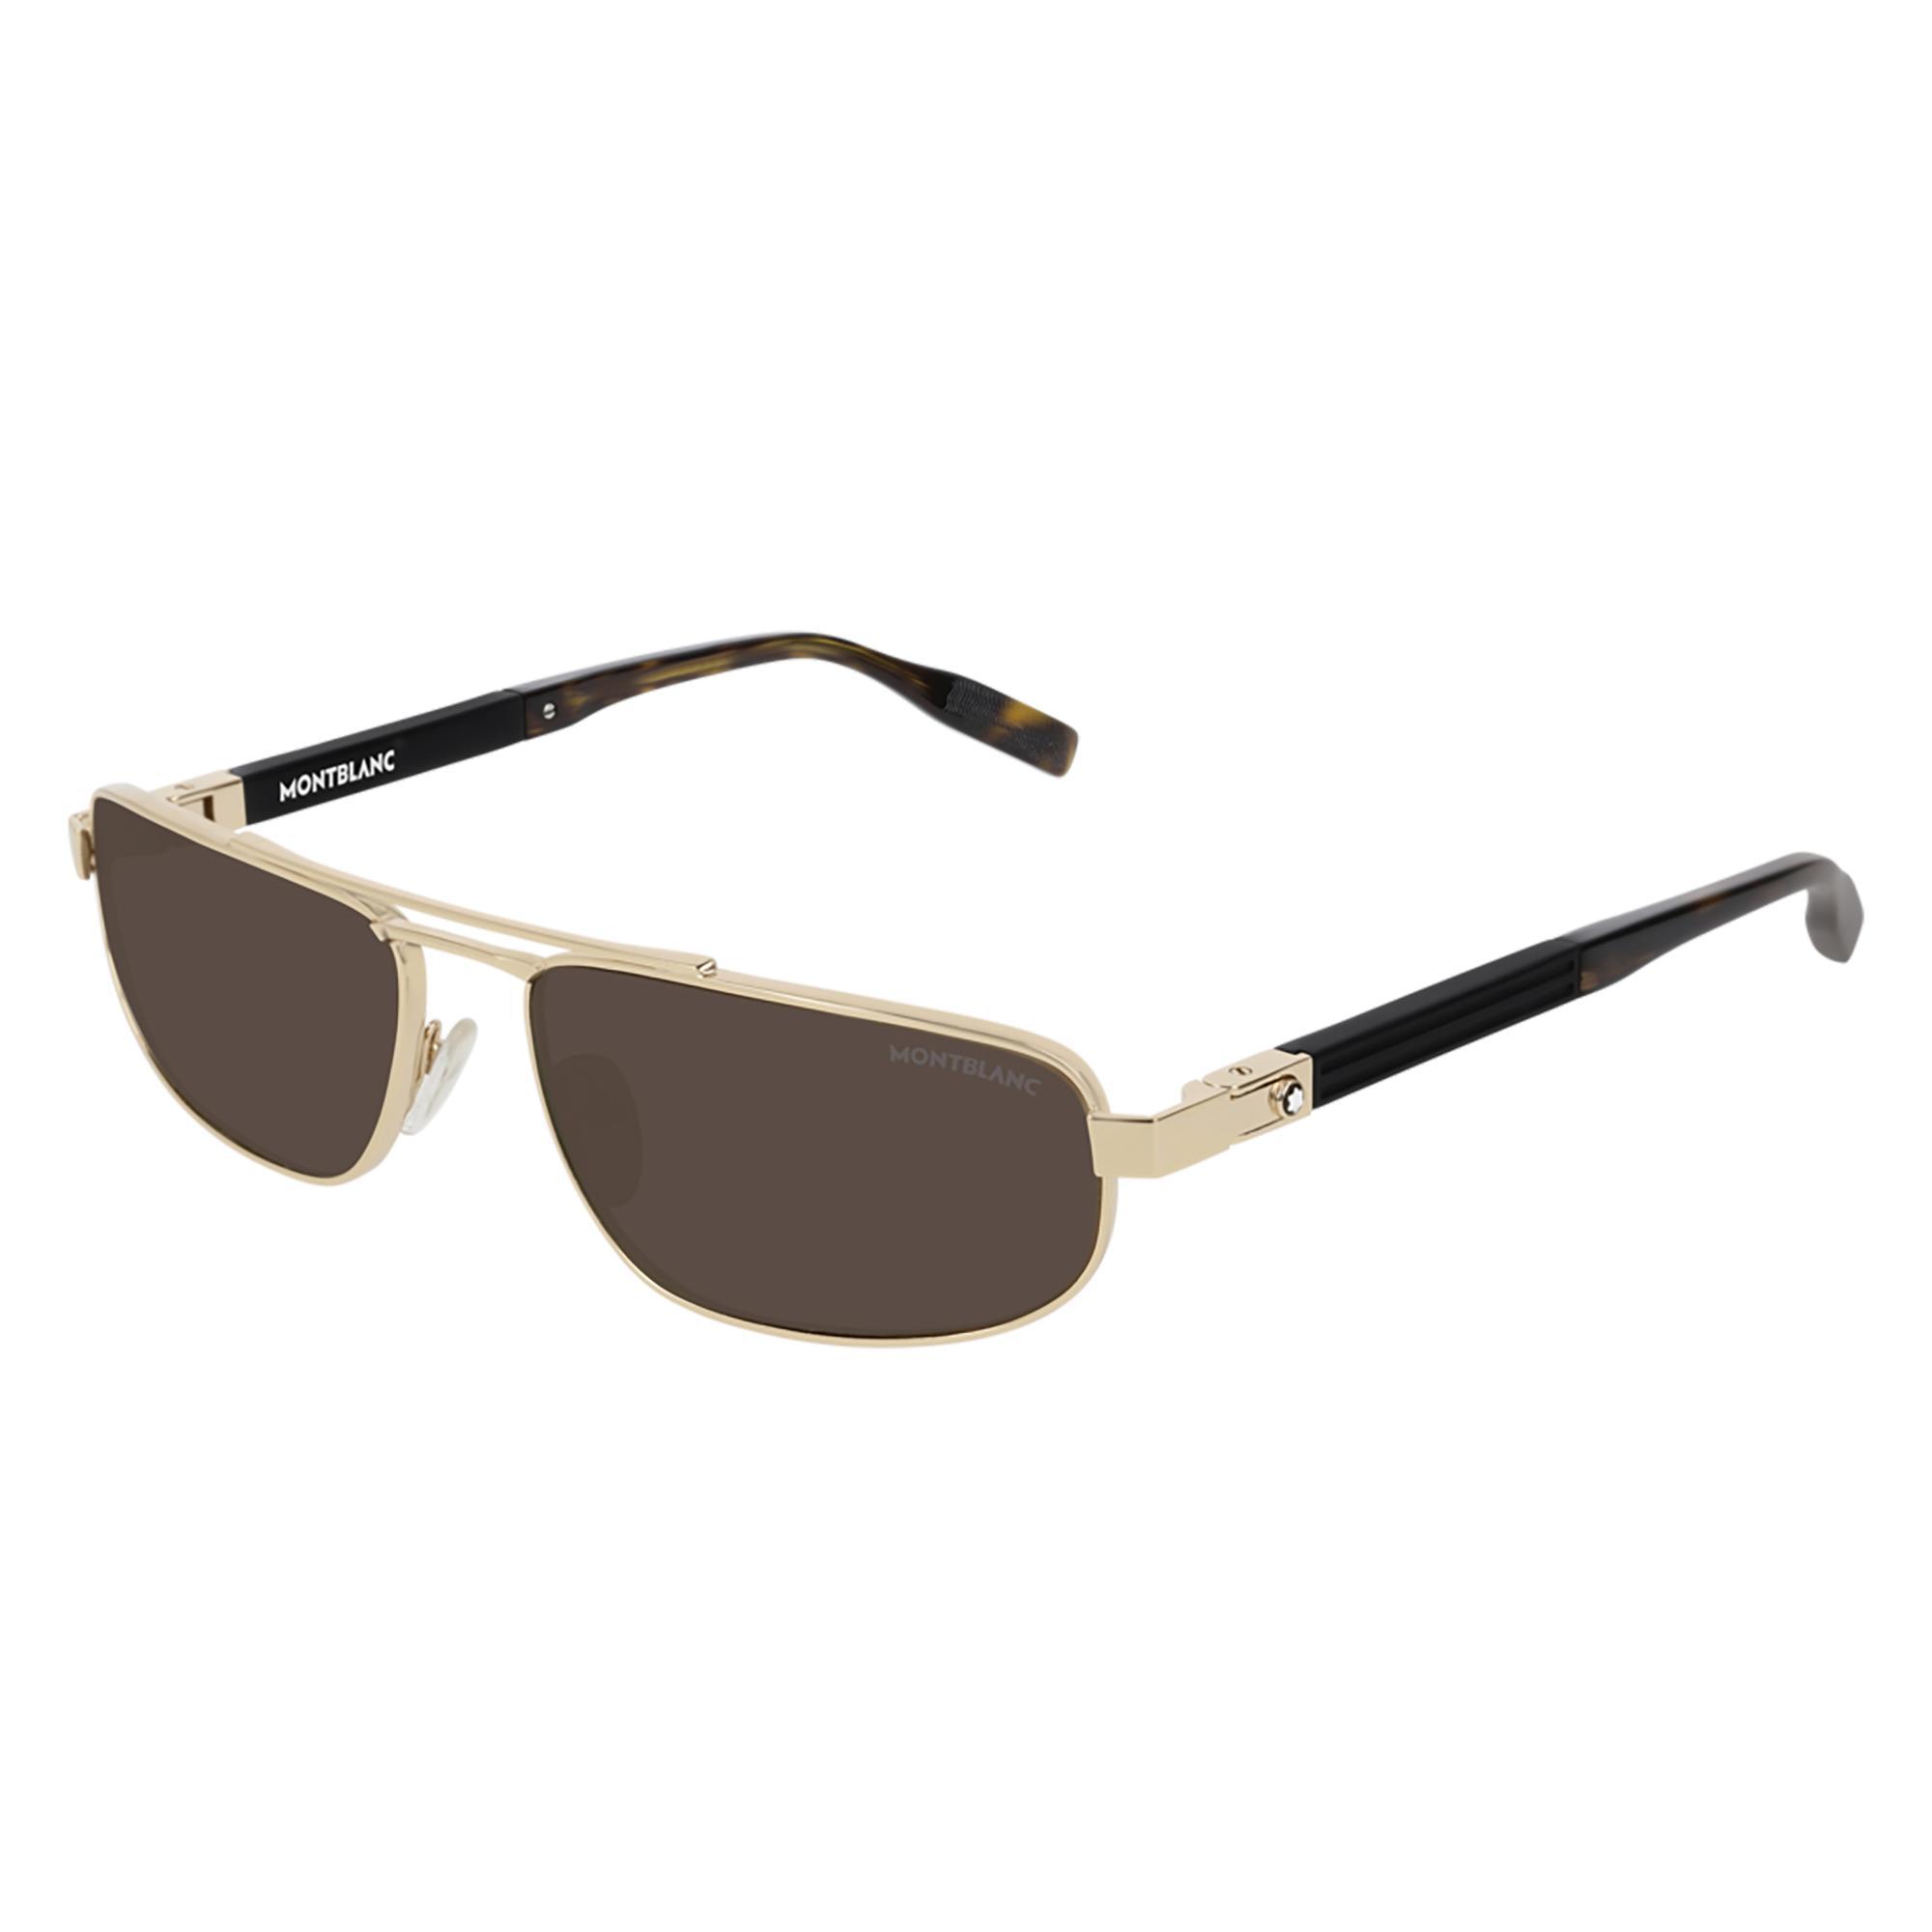 003 gold black brown